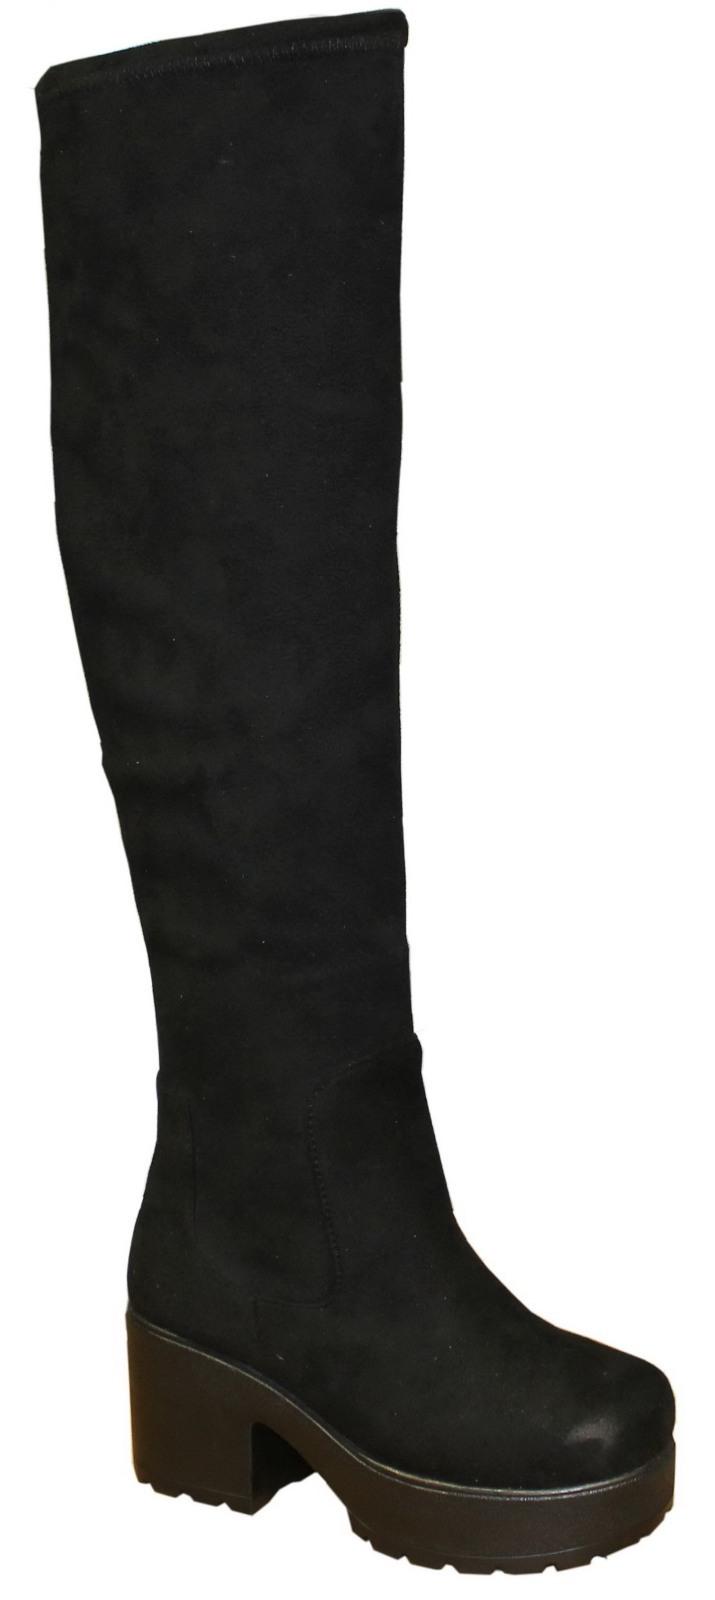 c91b85aa7fd Kids Girls Chunky Block Heel Chelsea Over Knee High Boots Thigh High ...